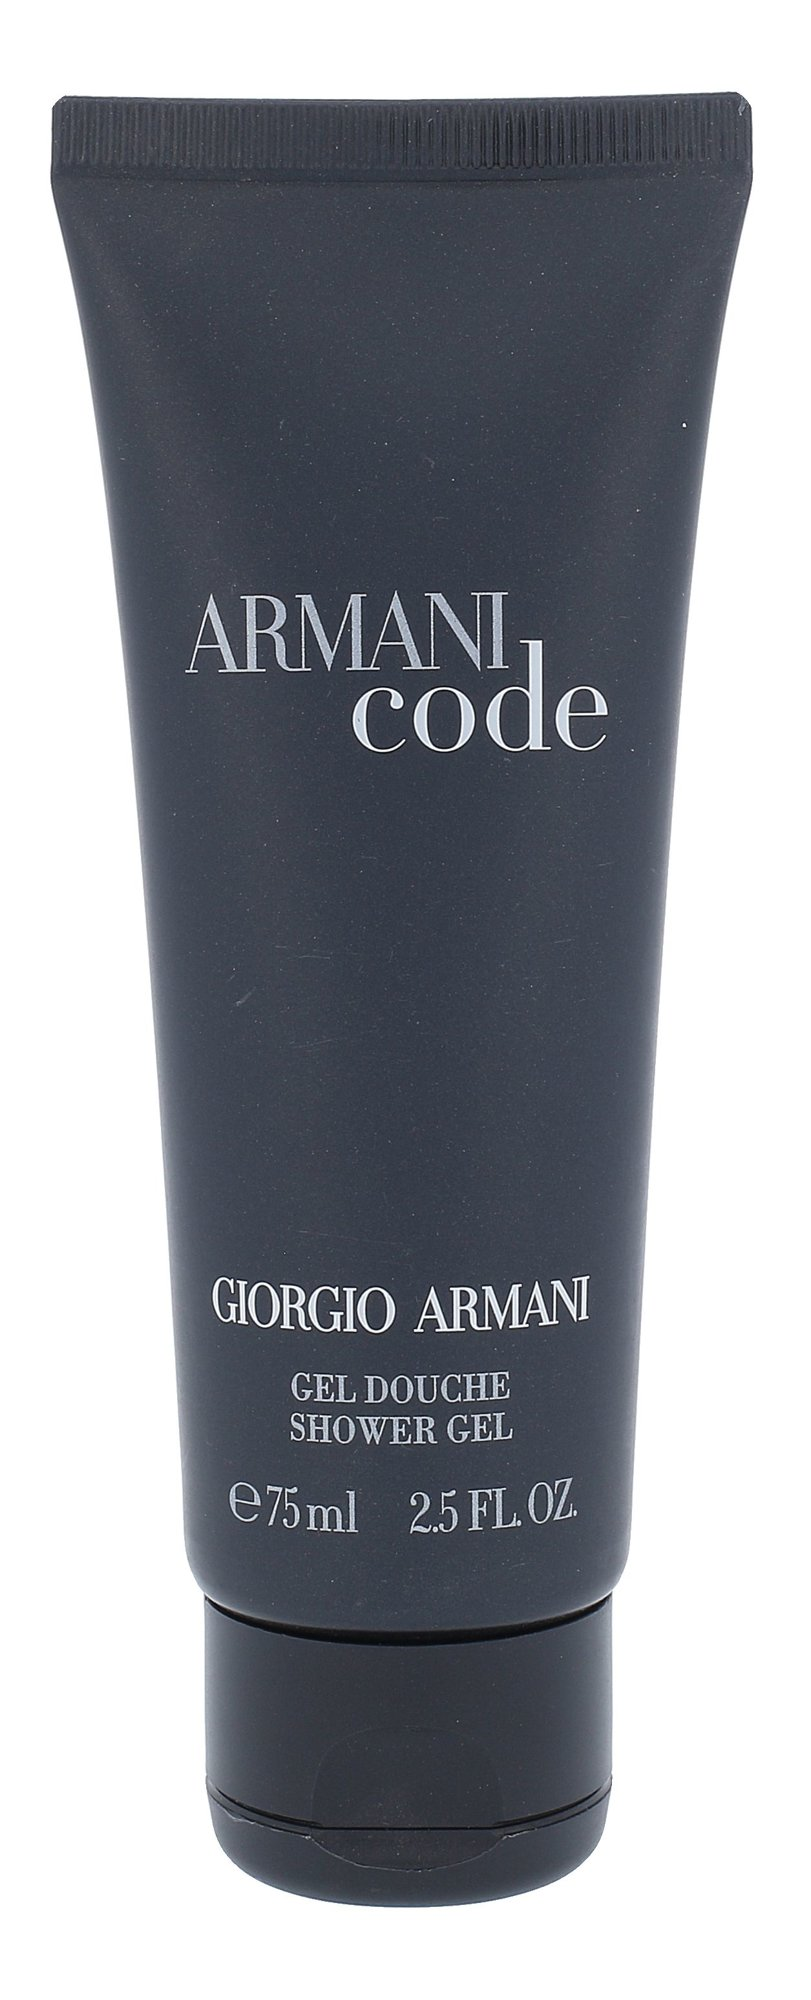 Giorgio Armani Armani Code Pour Homme Shower gel 75ml